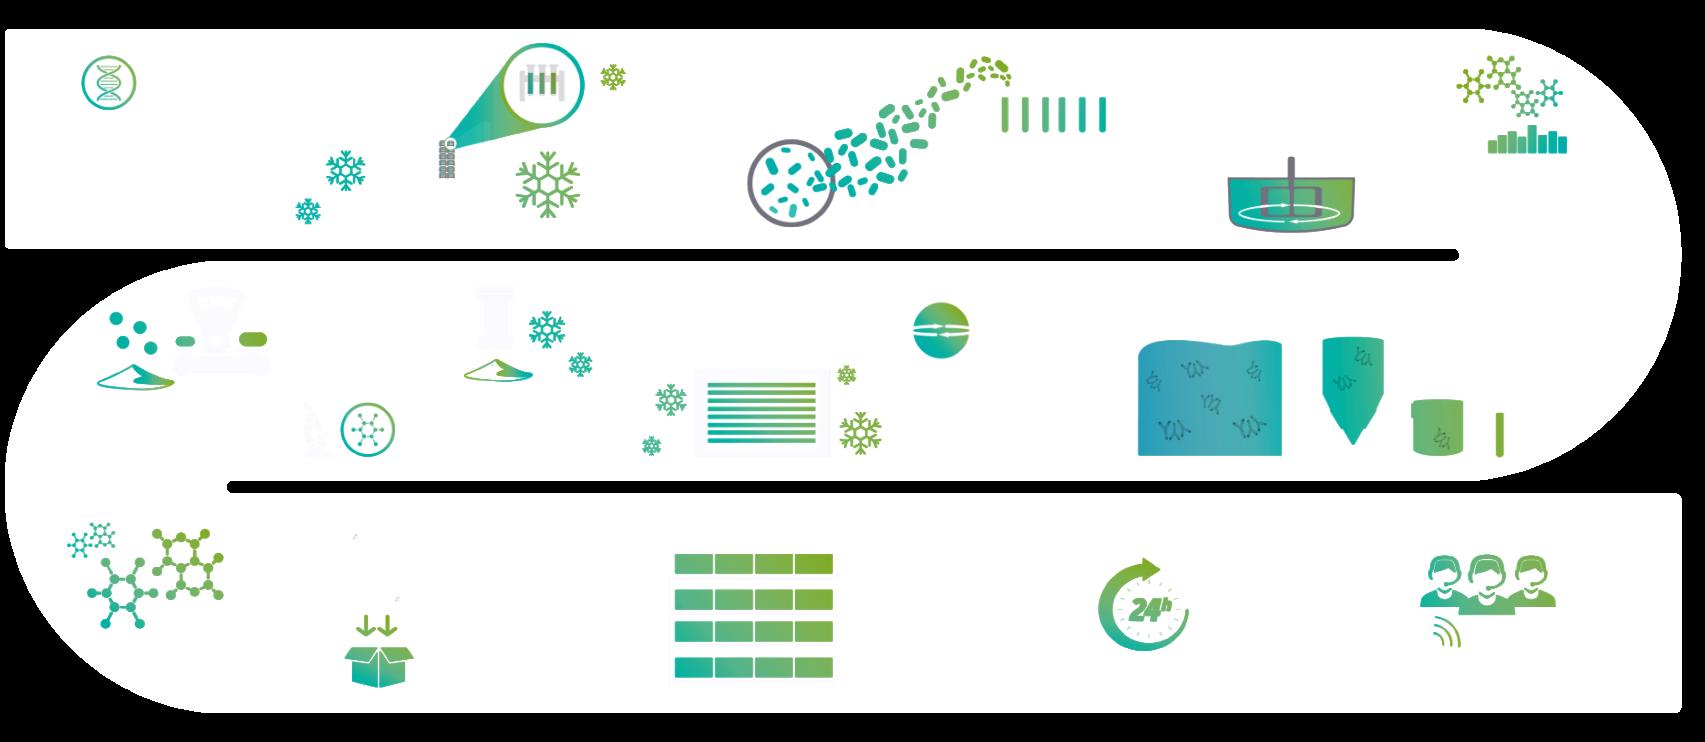 production process - custom fermentation services - Probiotics by Sacco System